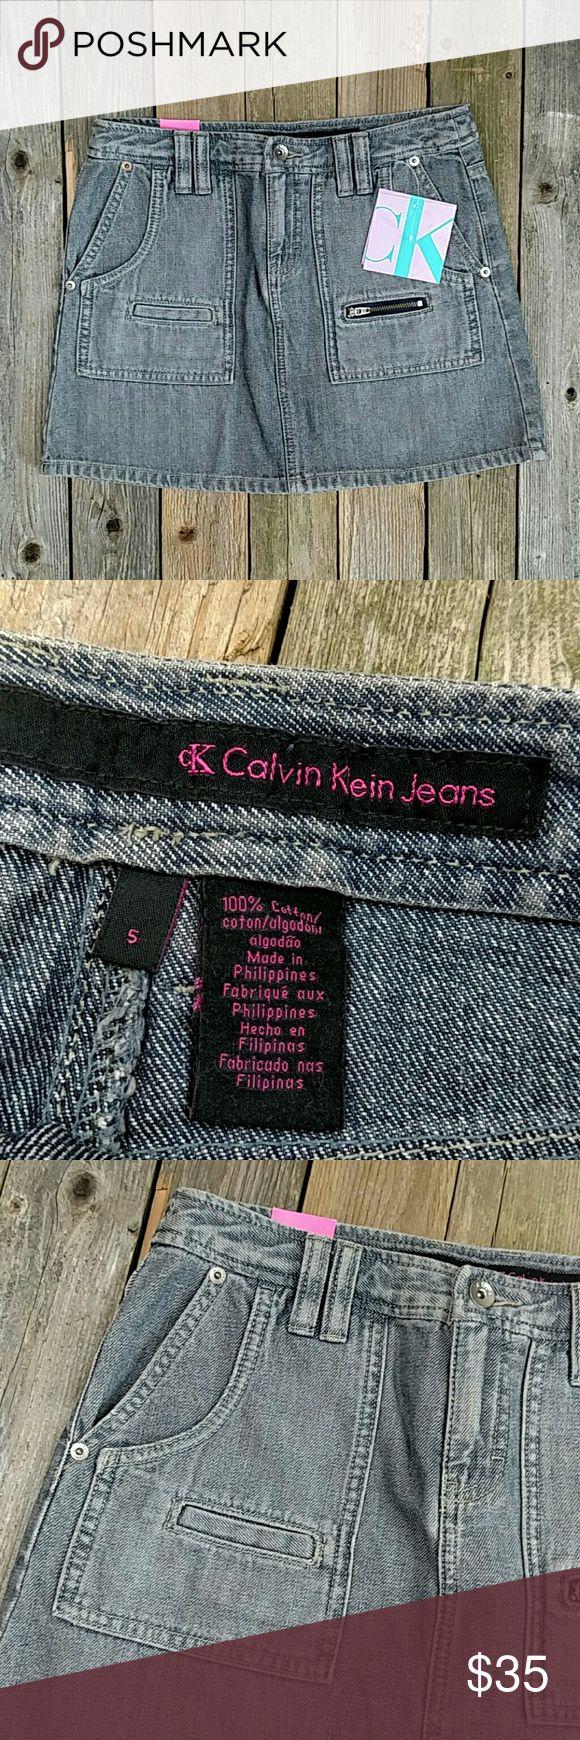 "CK Calvin Klein Jeans Denim Mini Skirt NWT Super cute denim mini with a throwback 90's feel! About 14"" waist to hem and 14.5"" across waist; laid flat. No stretch. No trades! NWT Calvin Klein Jeans Skirts Mini"